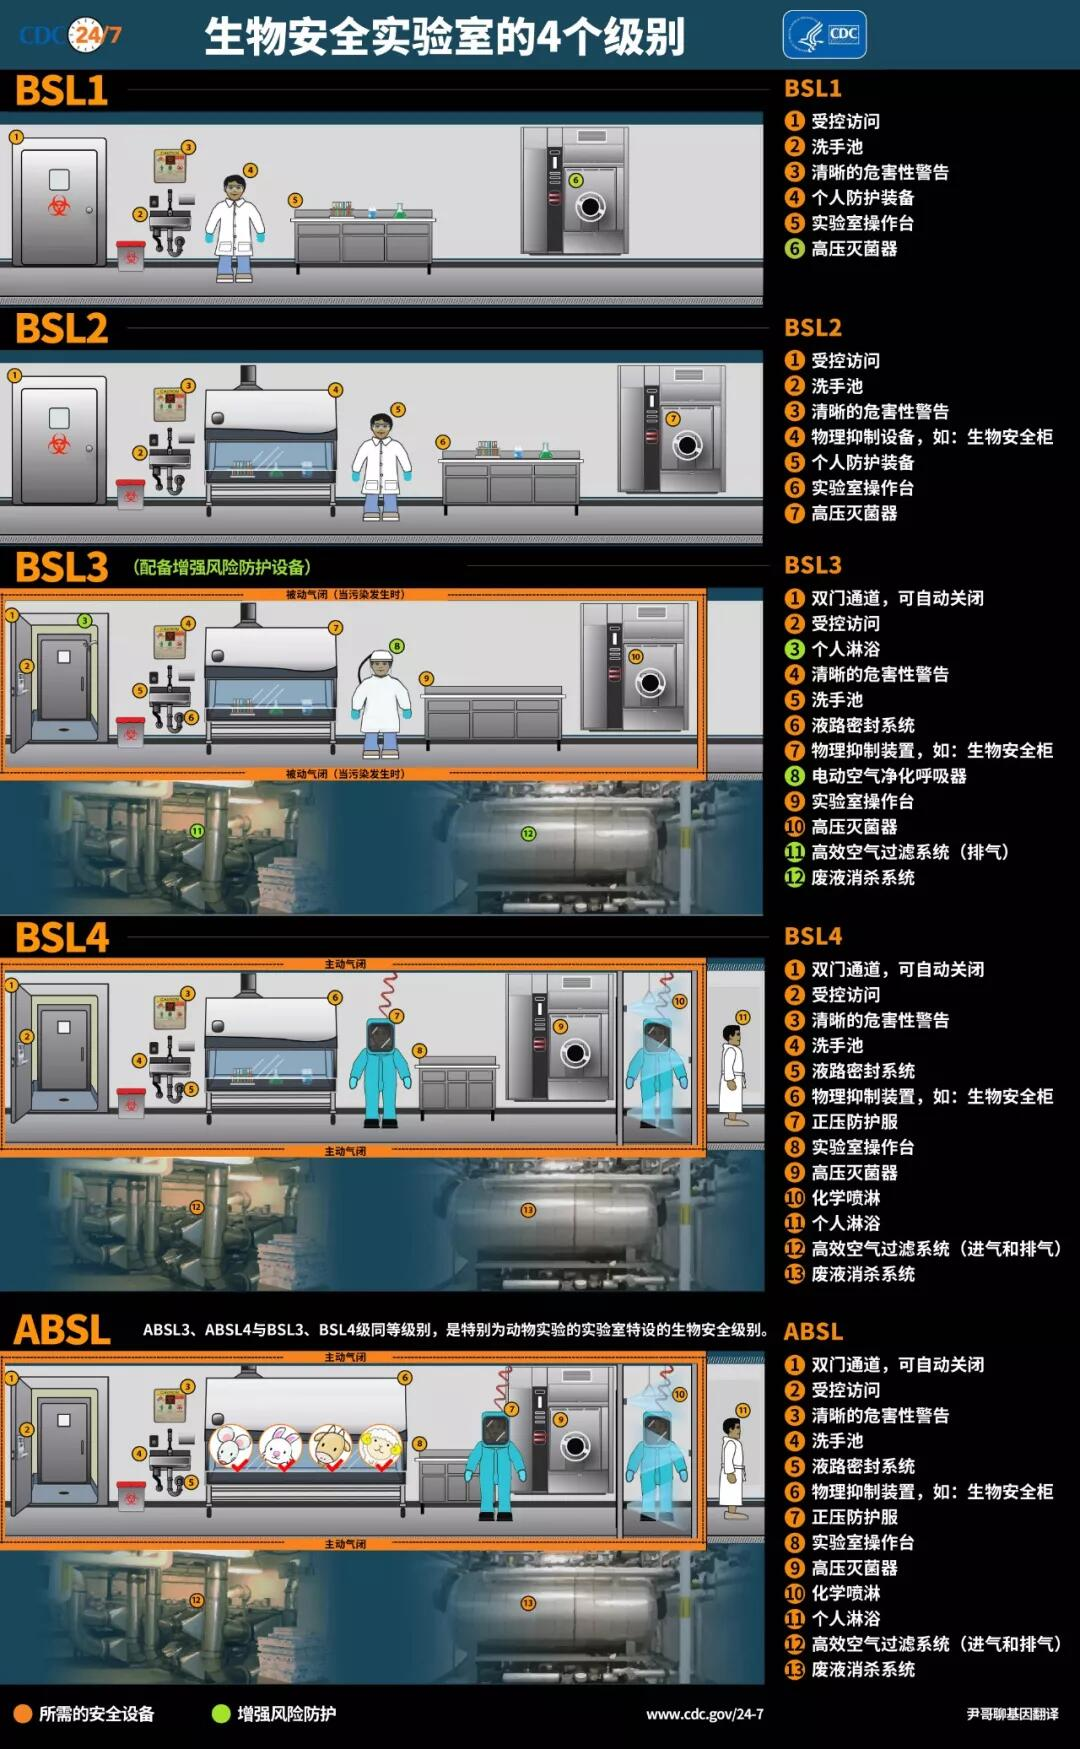 BSL-4-1.jpg